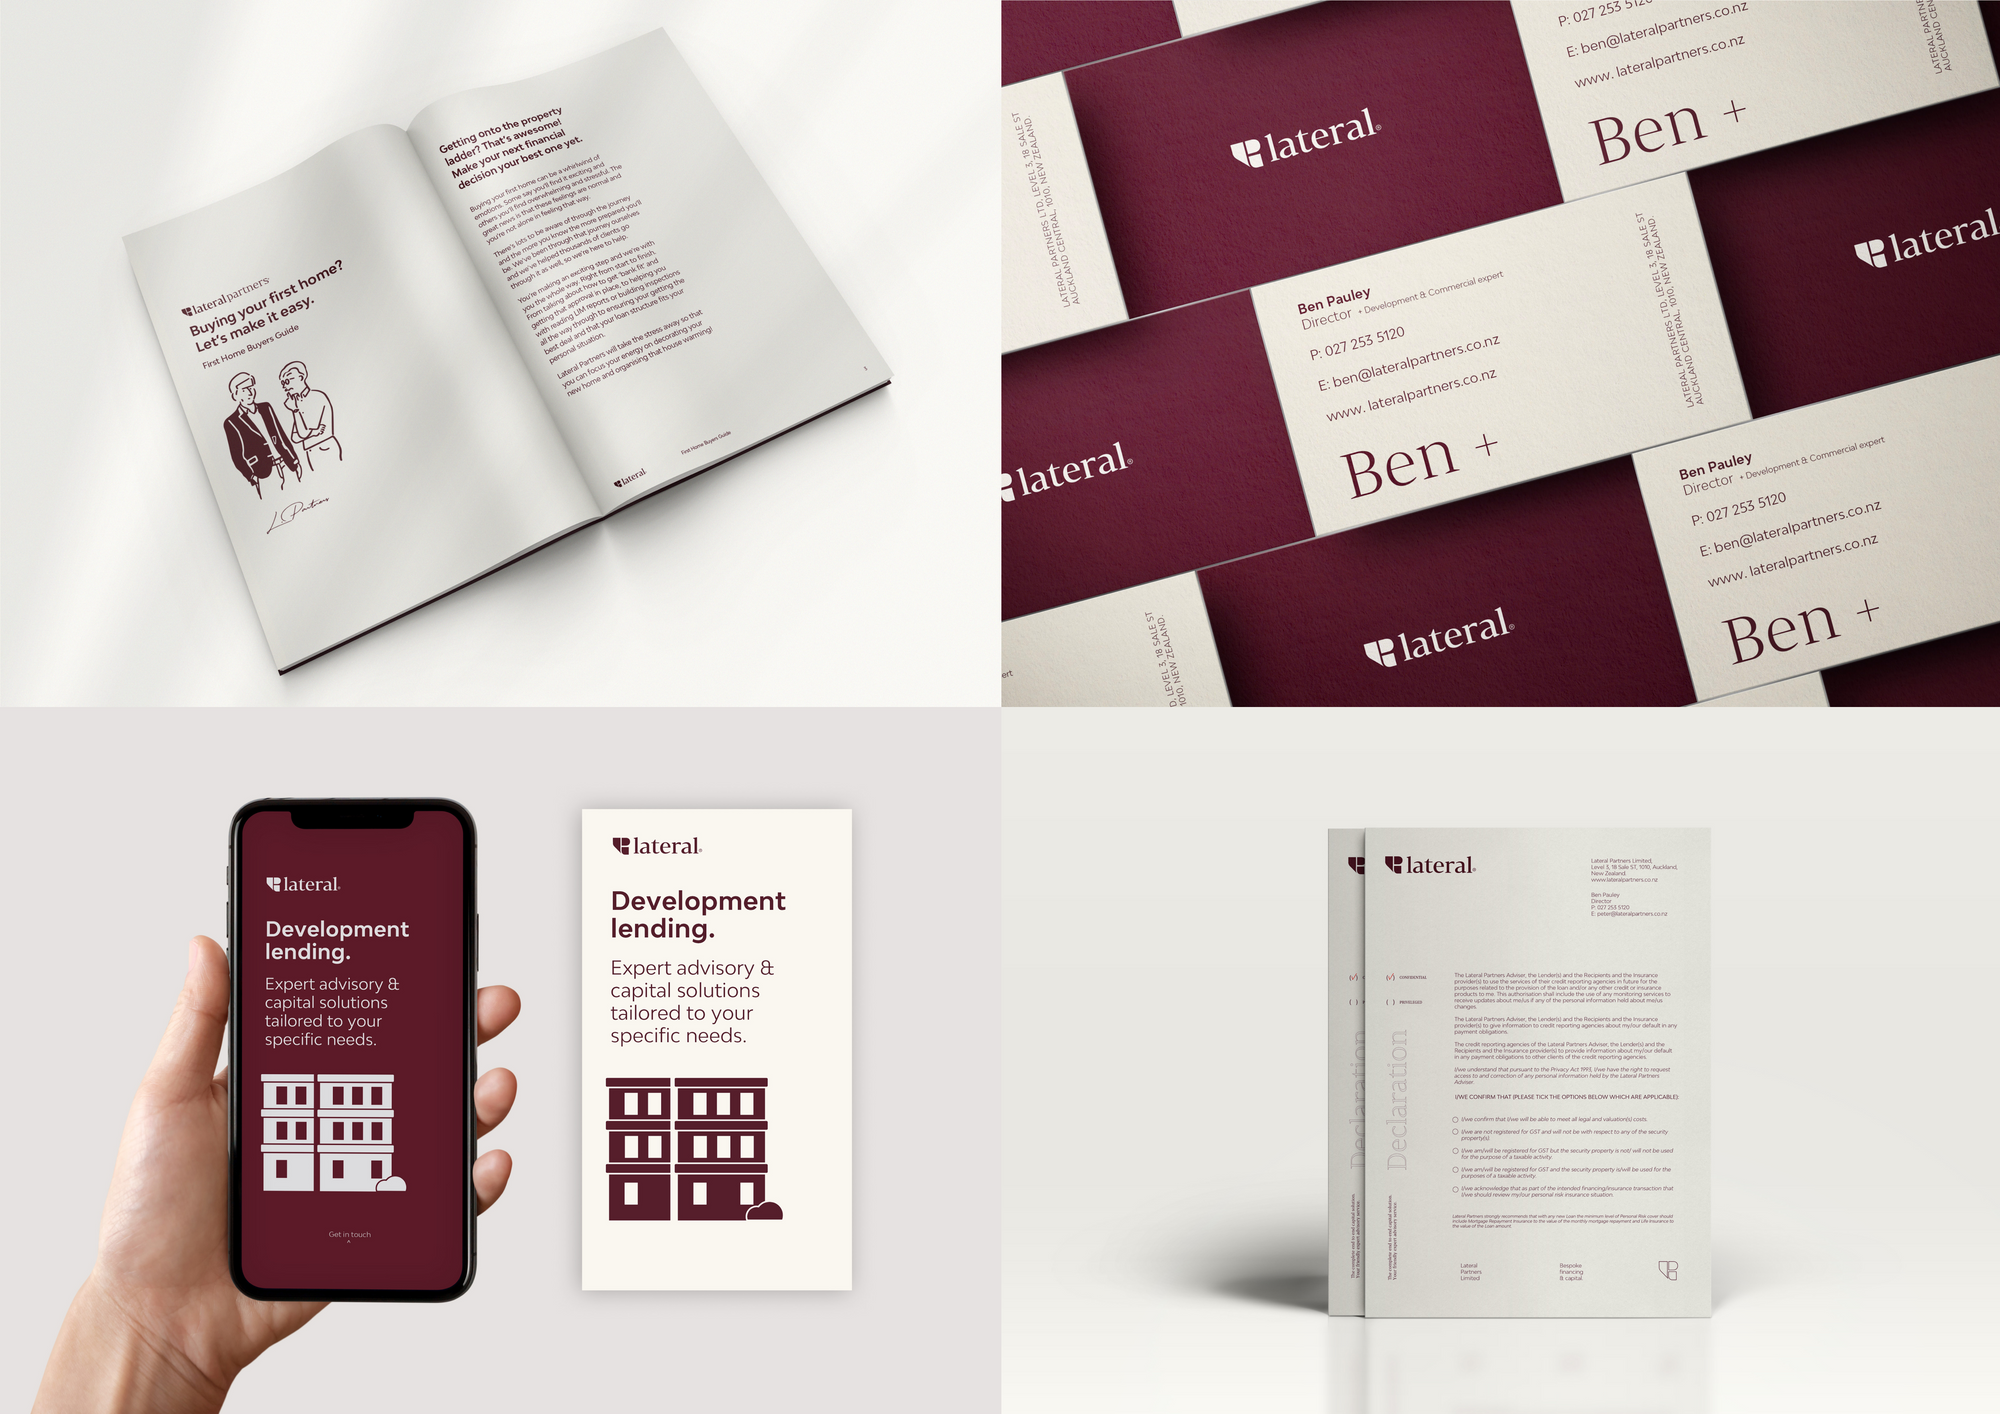 Lateral Partners - digital marketing